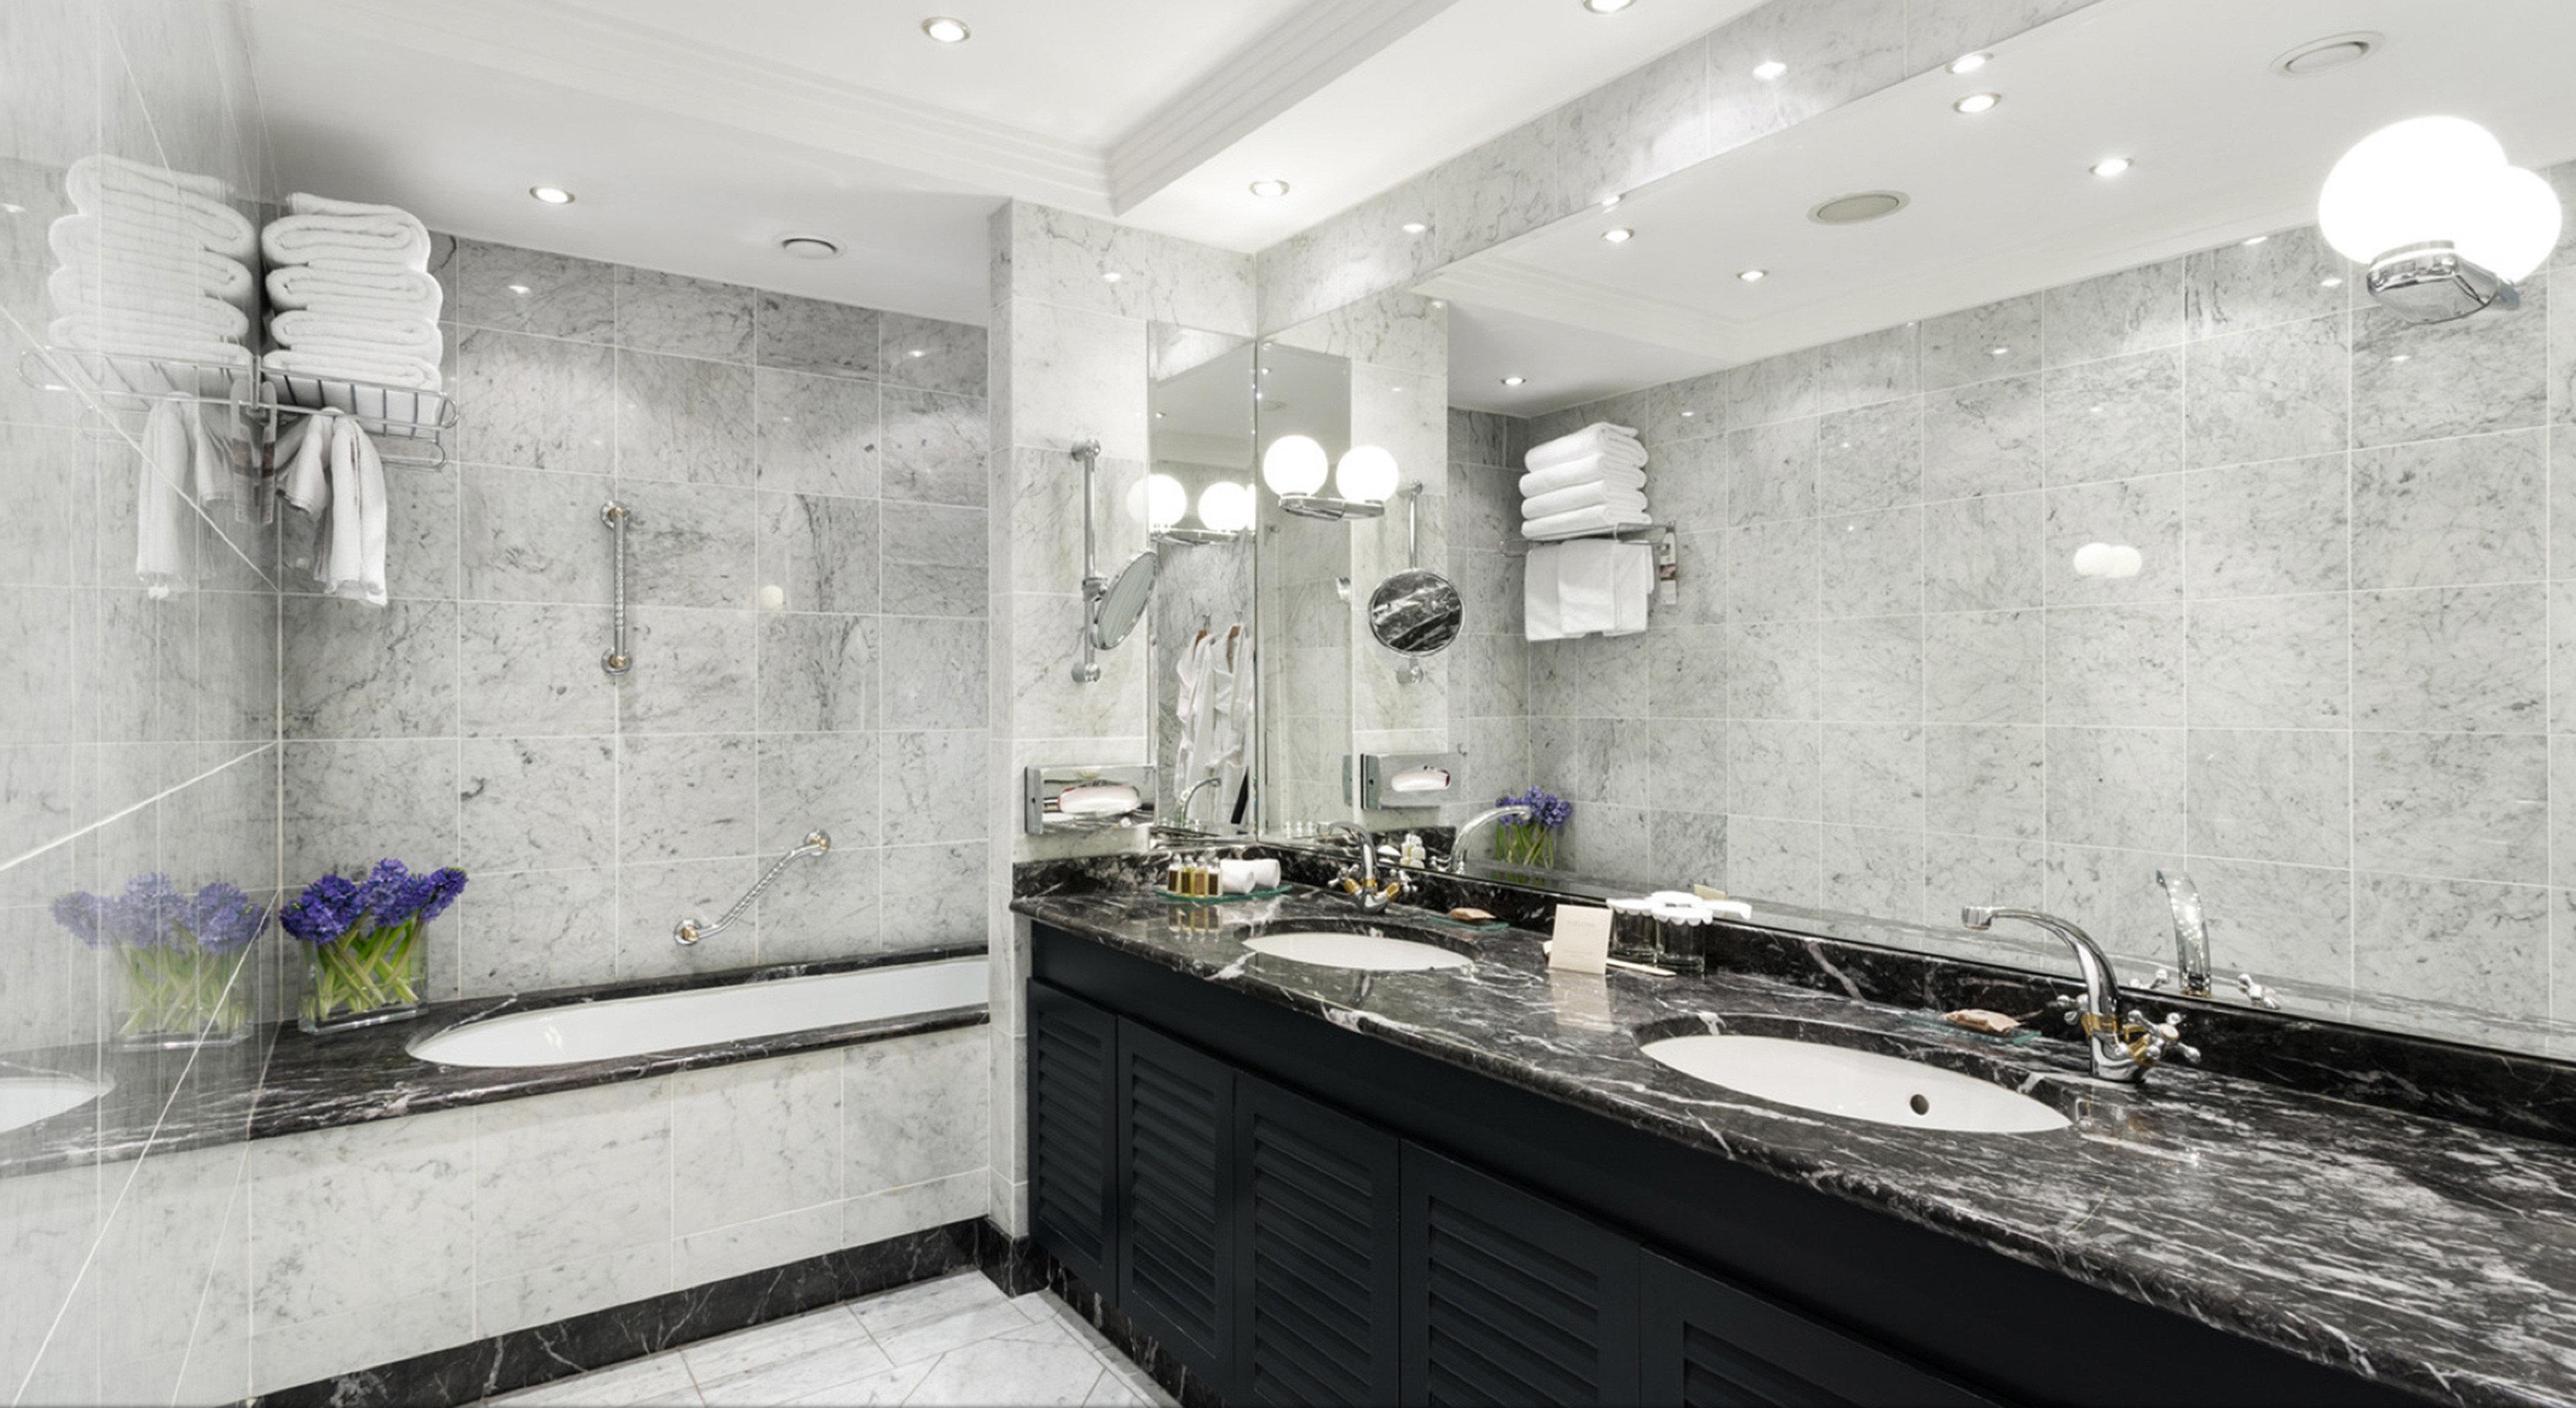 Bath Luxury Modern bathroom property counter plumbing fixture bathtub flooring